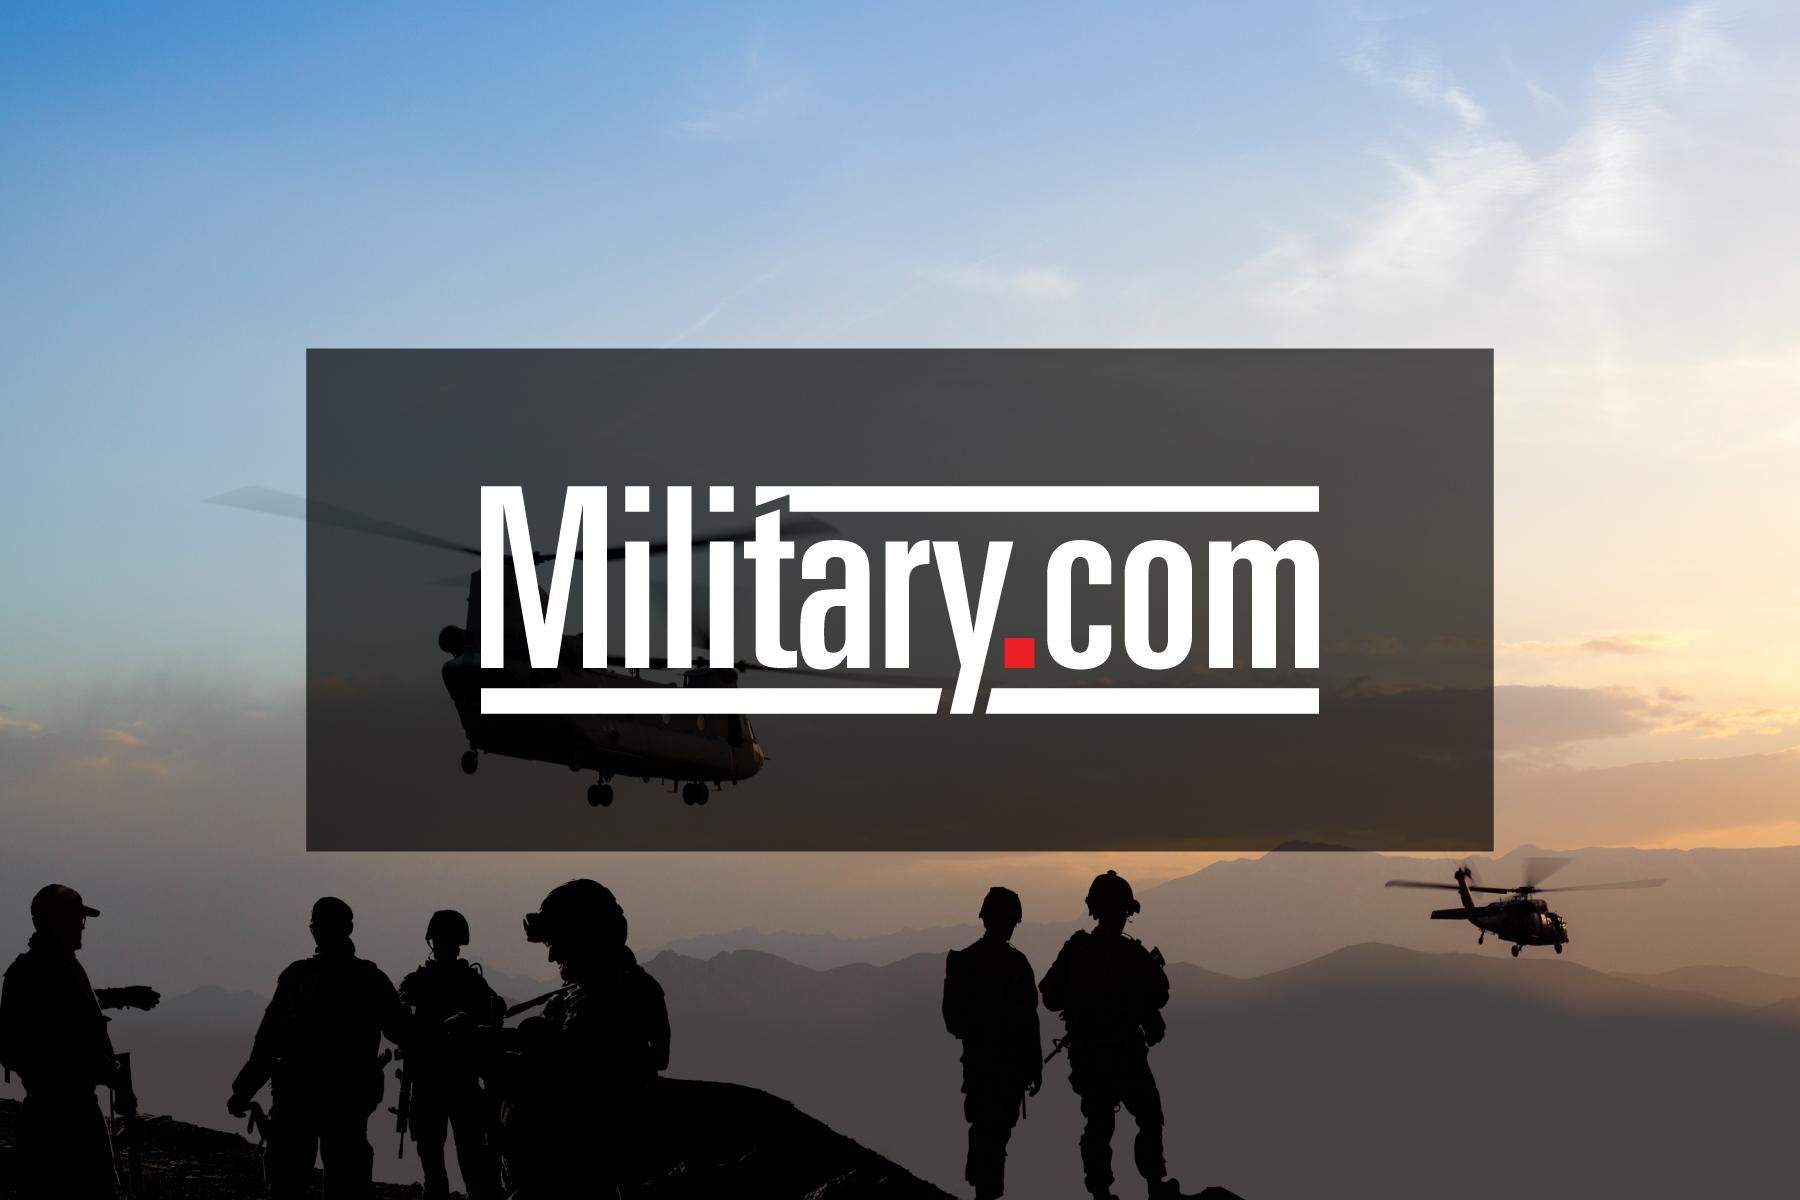 castillo-biography-600x400 Template Cover Letter Job Military Bio Biography Sample Zgshpd on